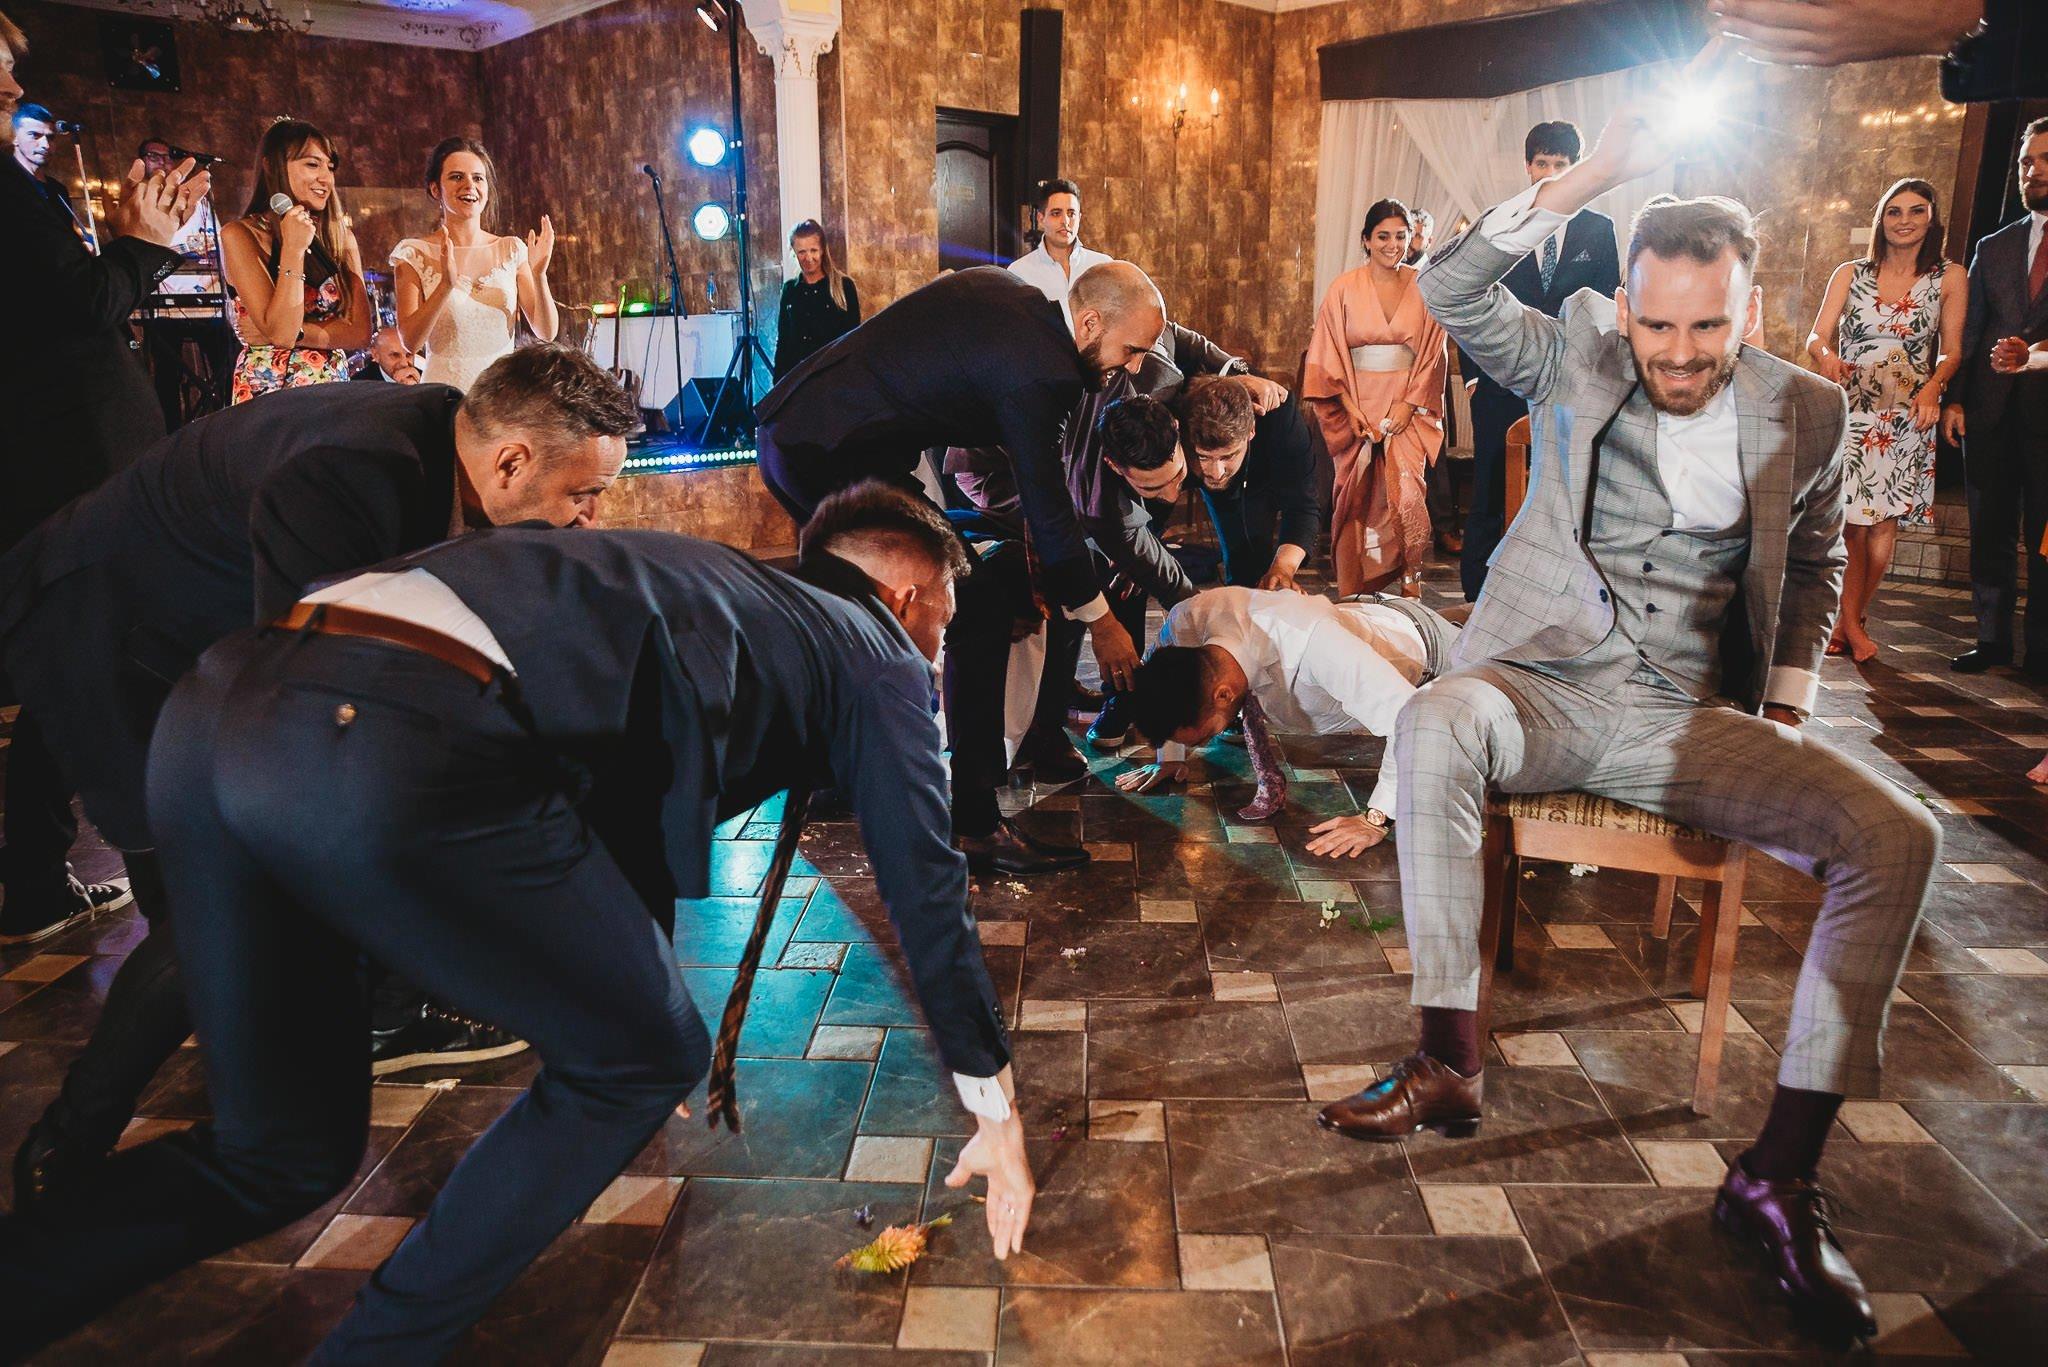 zabawa weselna, ślub, emocje, chłopaki, Jarocin